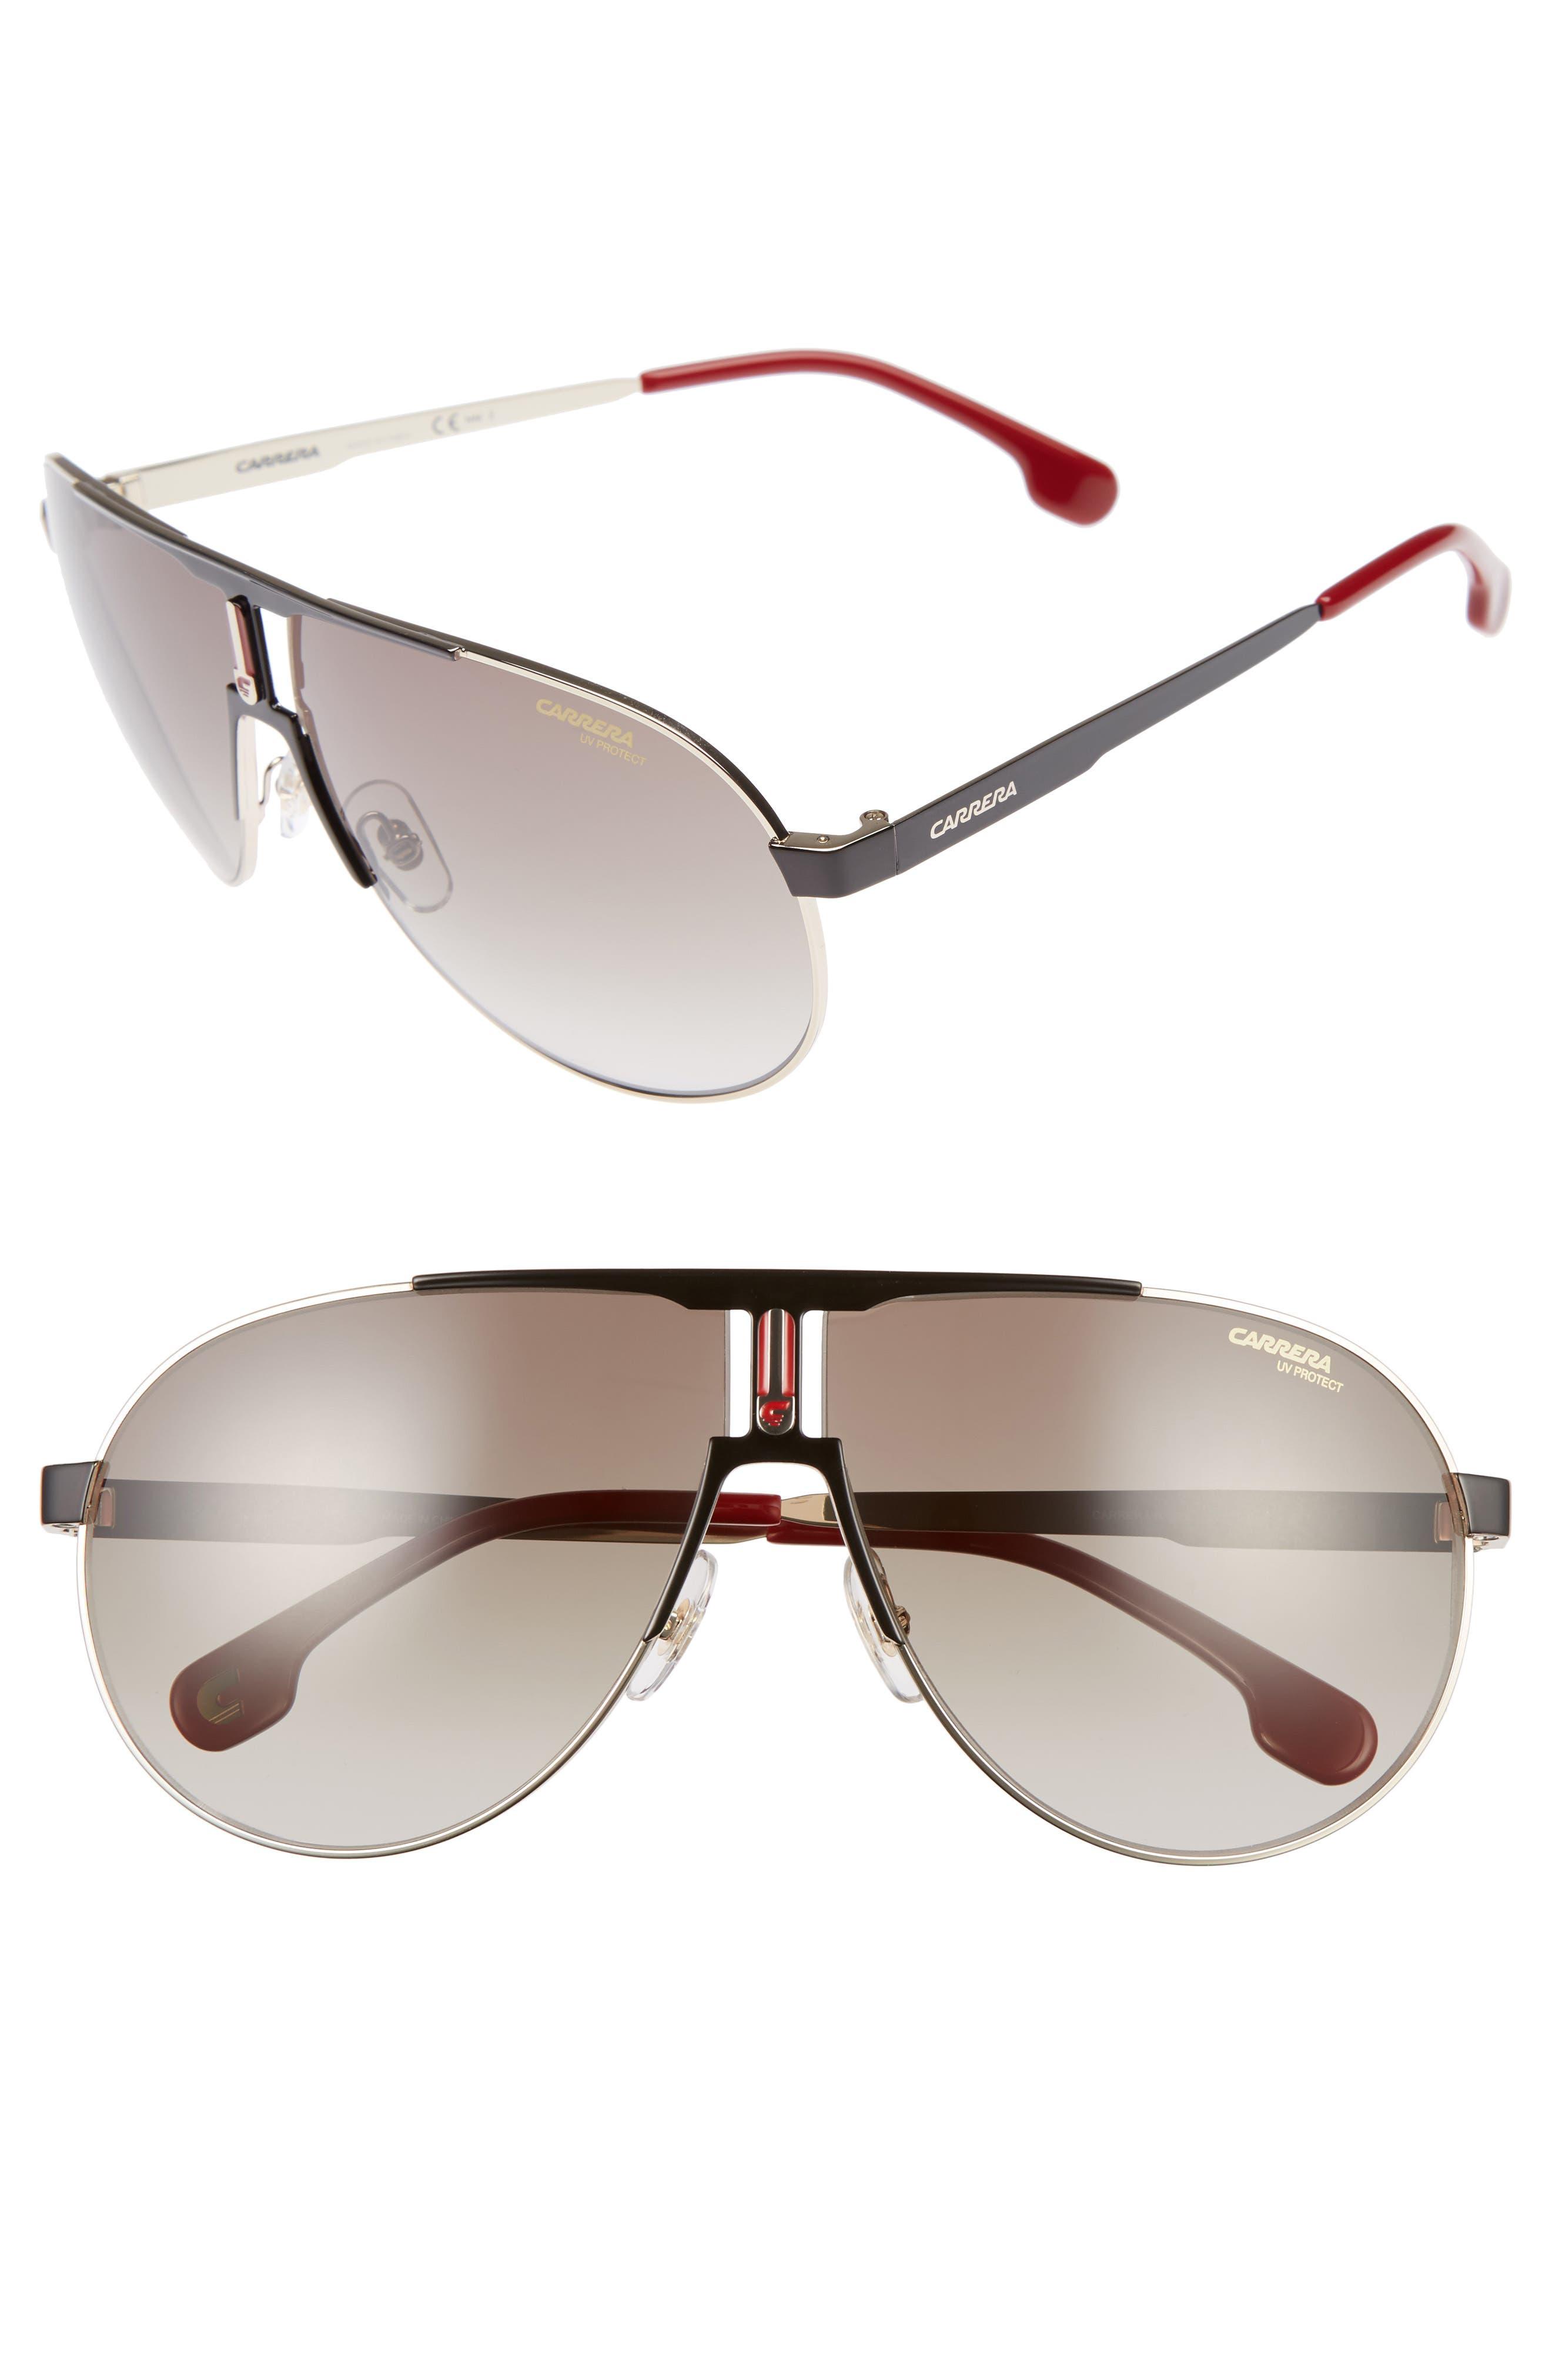 66mm Aviator Sunglasses,                             Alternate thumbnail 2, color,                             001